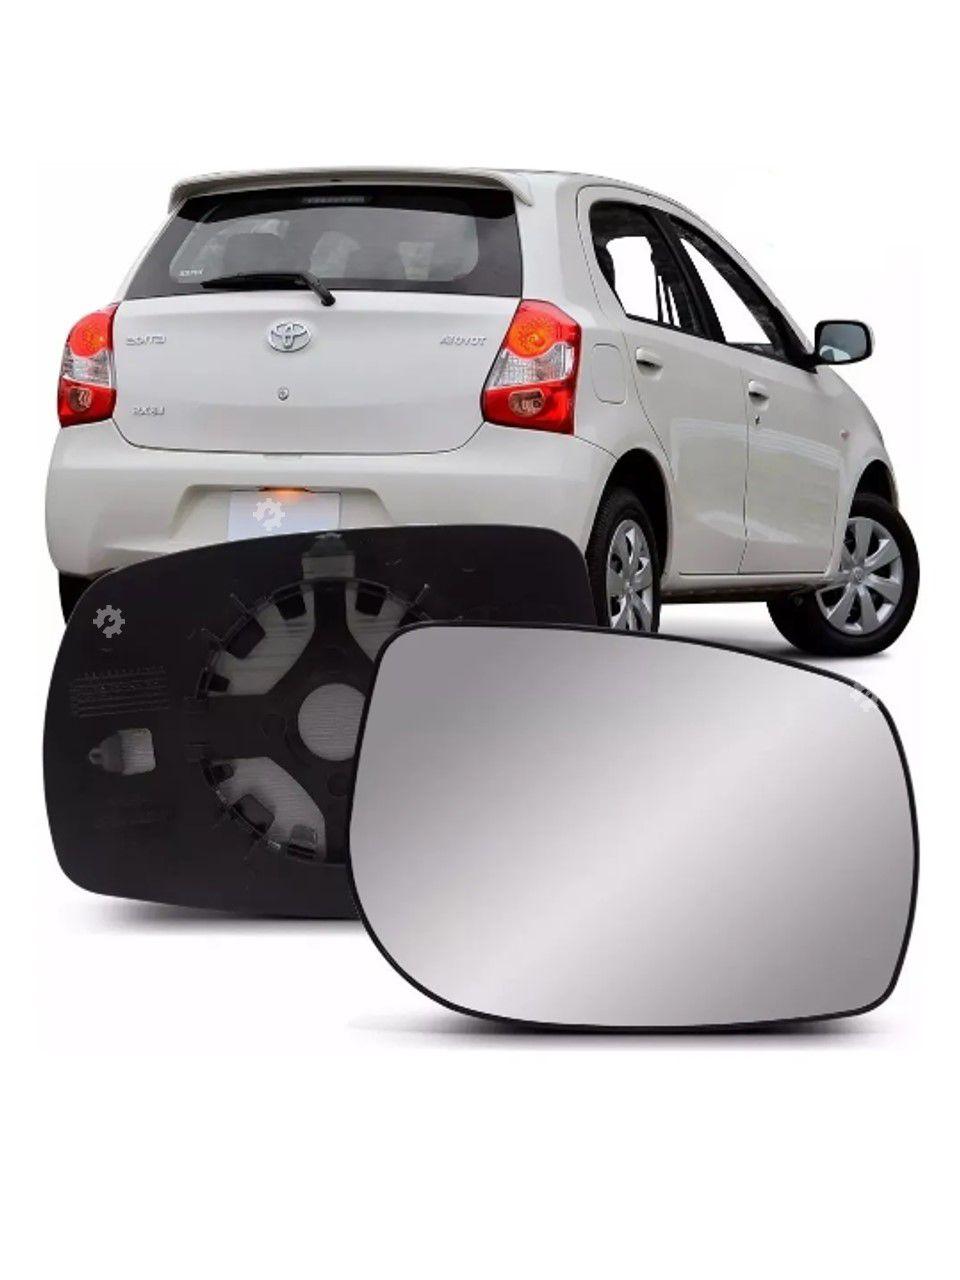 Lente base vidro Retrovisor esquerdo Toyota Etios 2012 2013